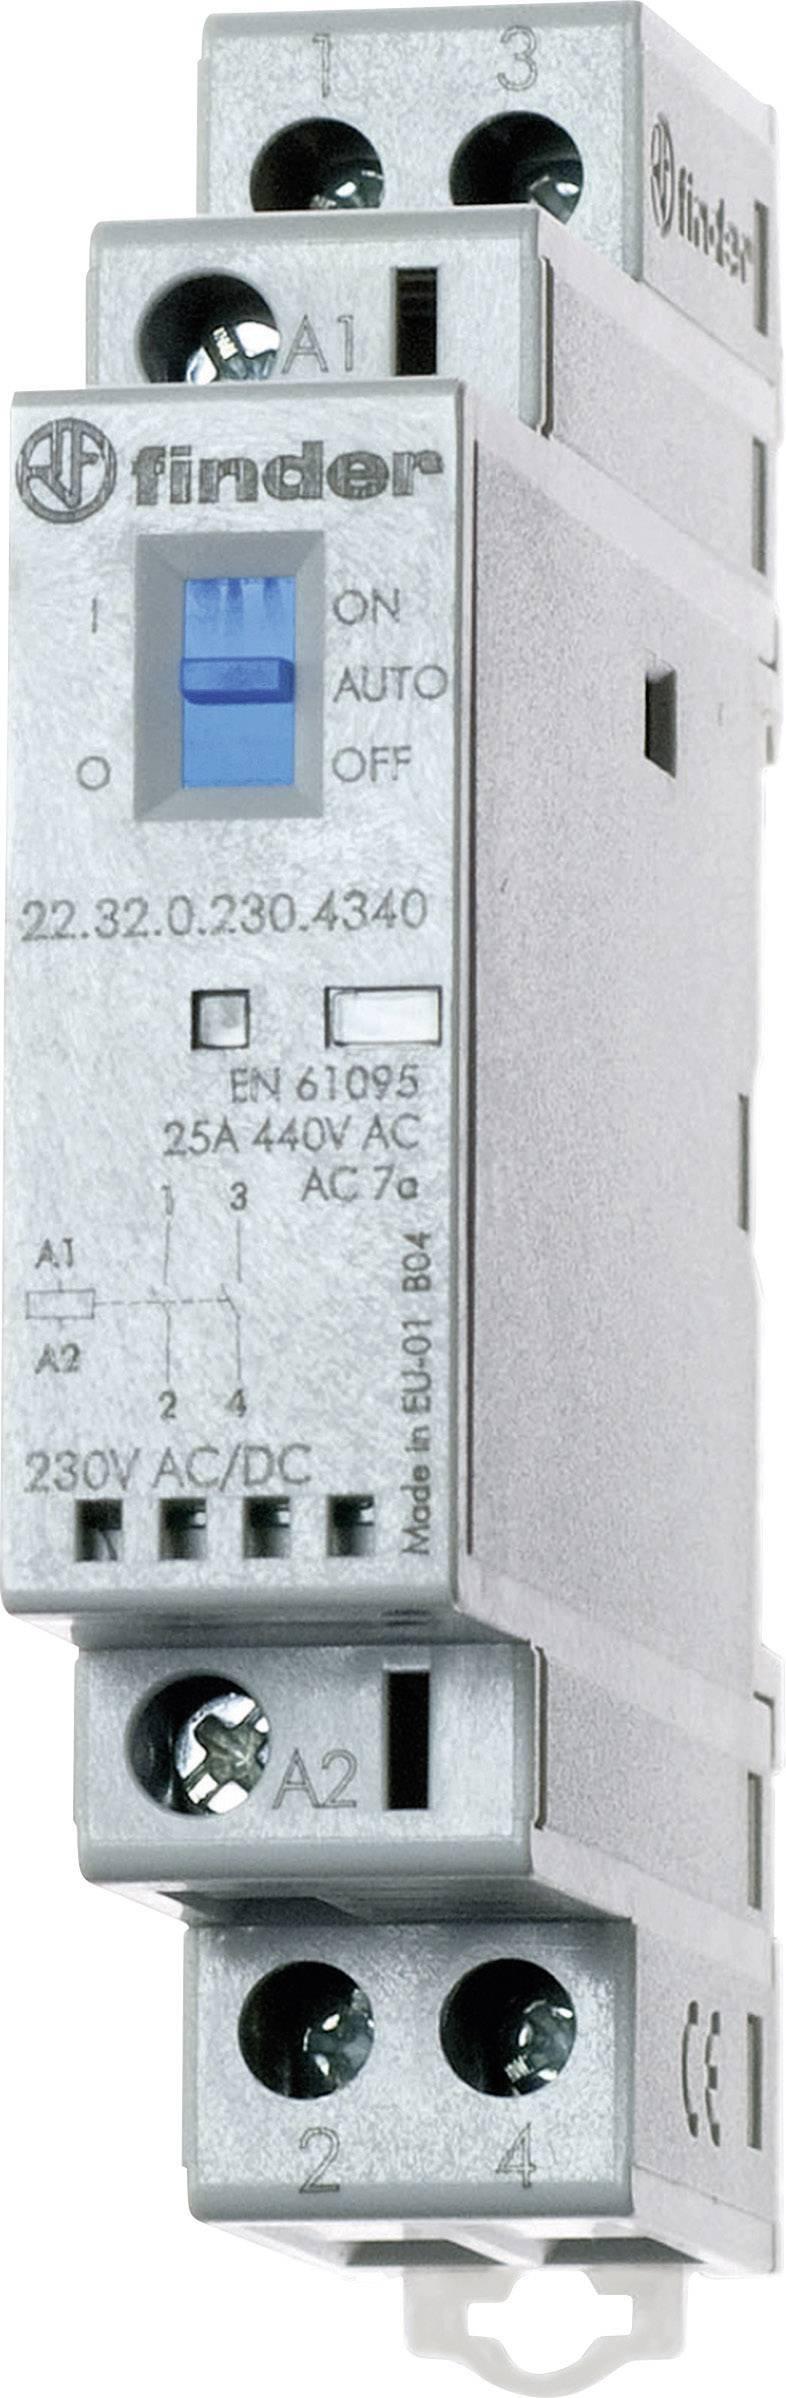 Stykač Finder 22.32.0.230.1520, 230 V/DC, 230 V/AC, 25 A, 1 ks